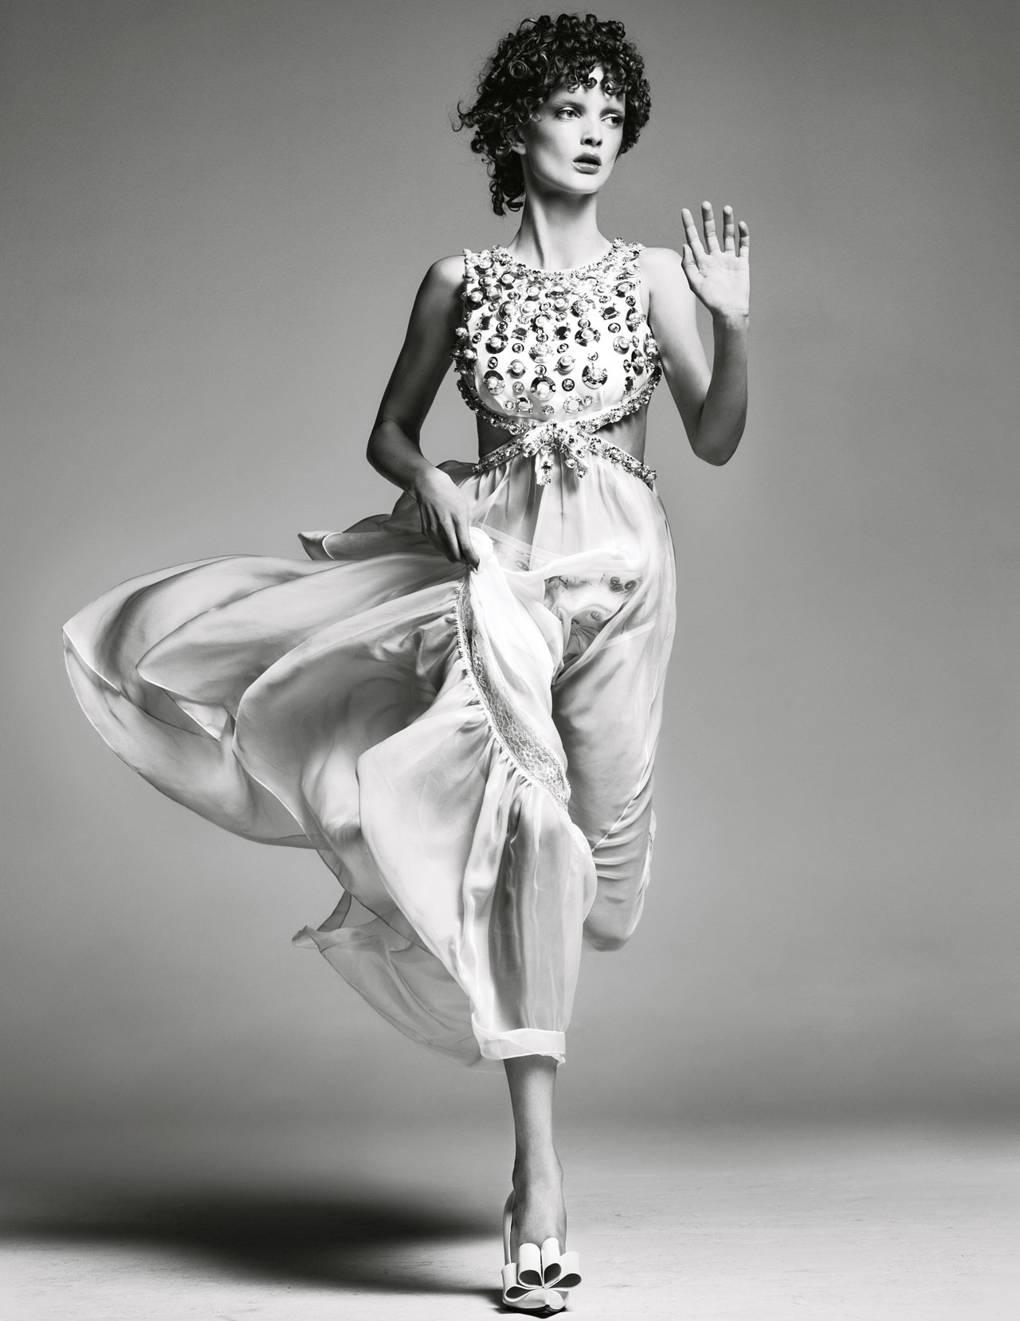 f478909e0c97 Black-Tie Dress Code For Women: The Vogue Guide | British Vogue